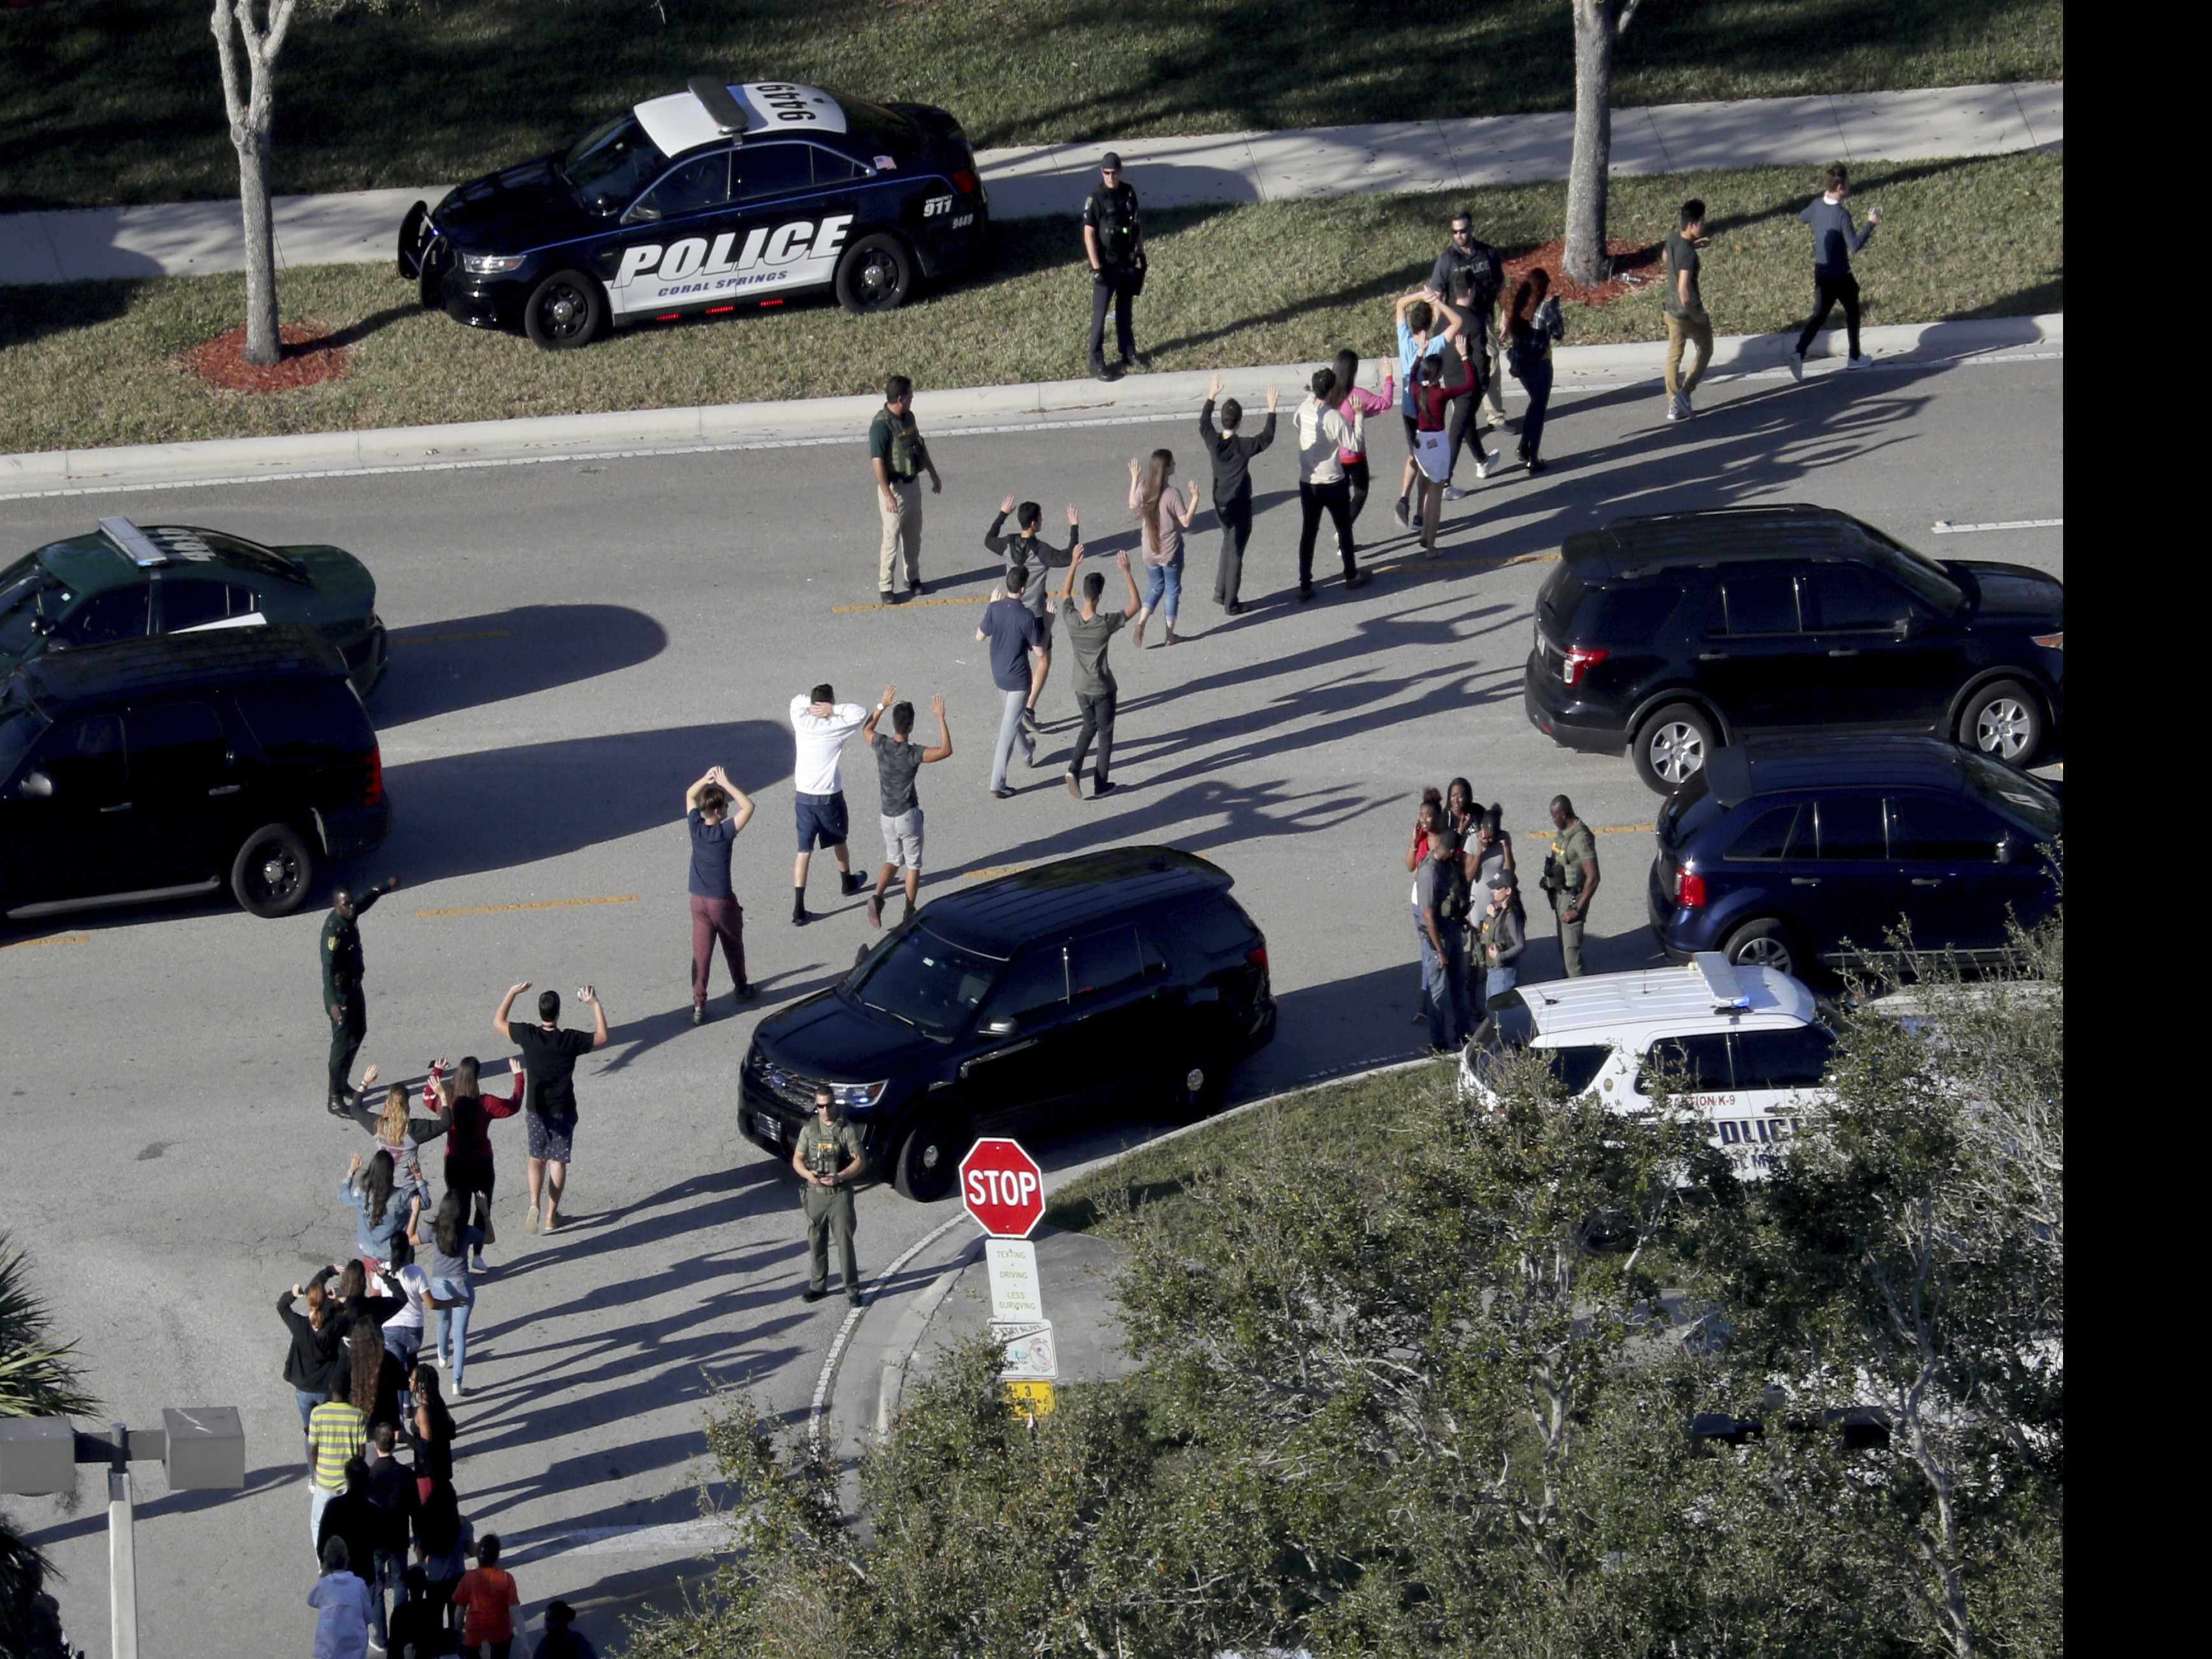 Doctors Blast Trump's Mental Illness Focus to Fight Violence